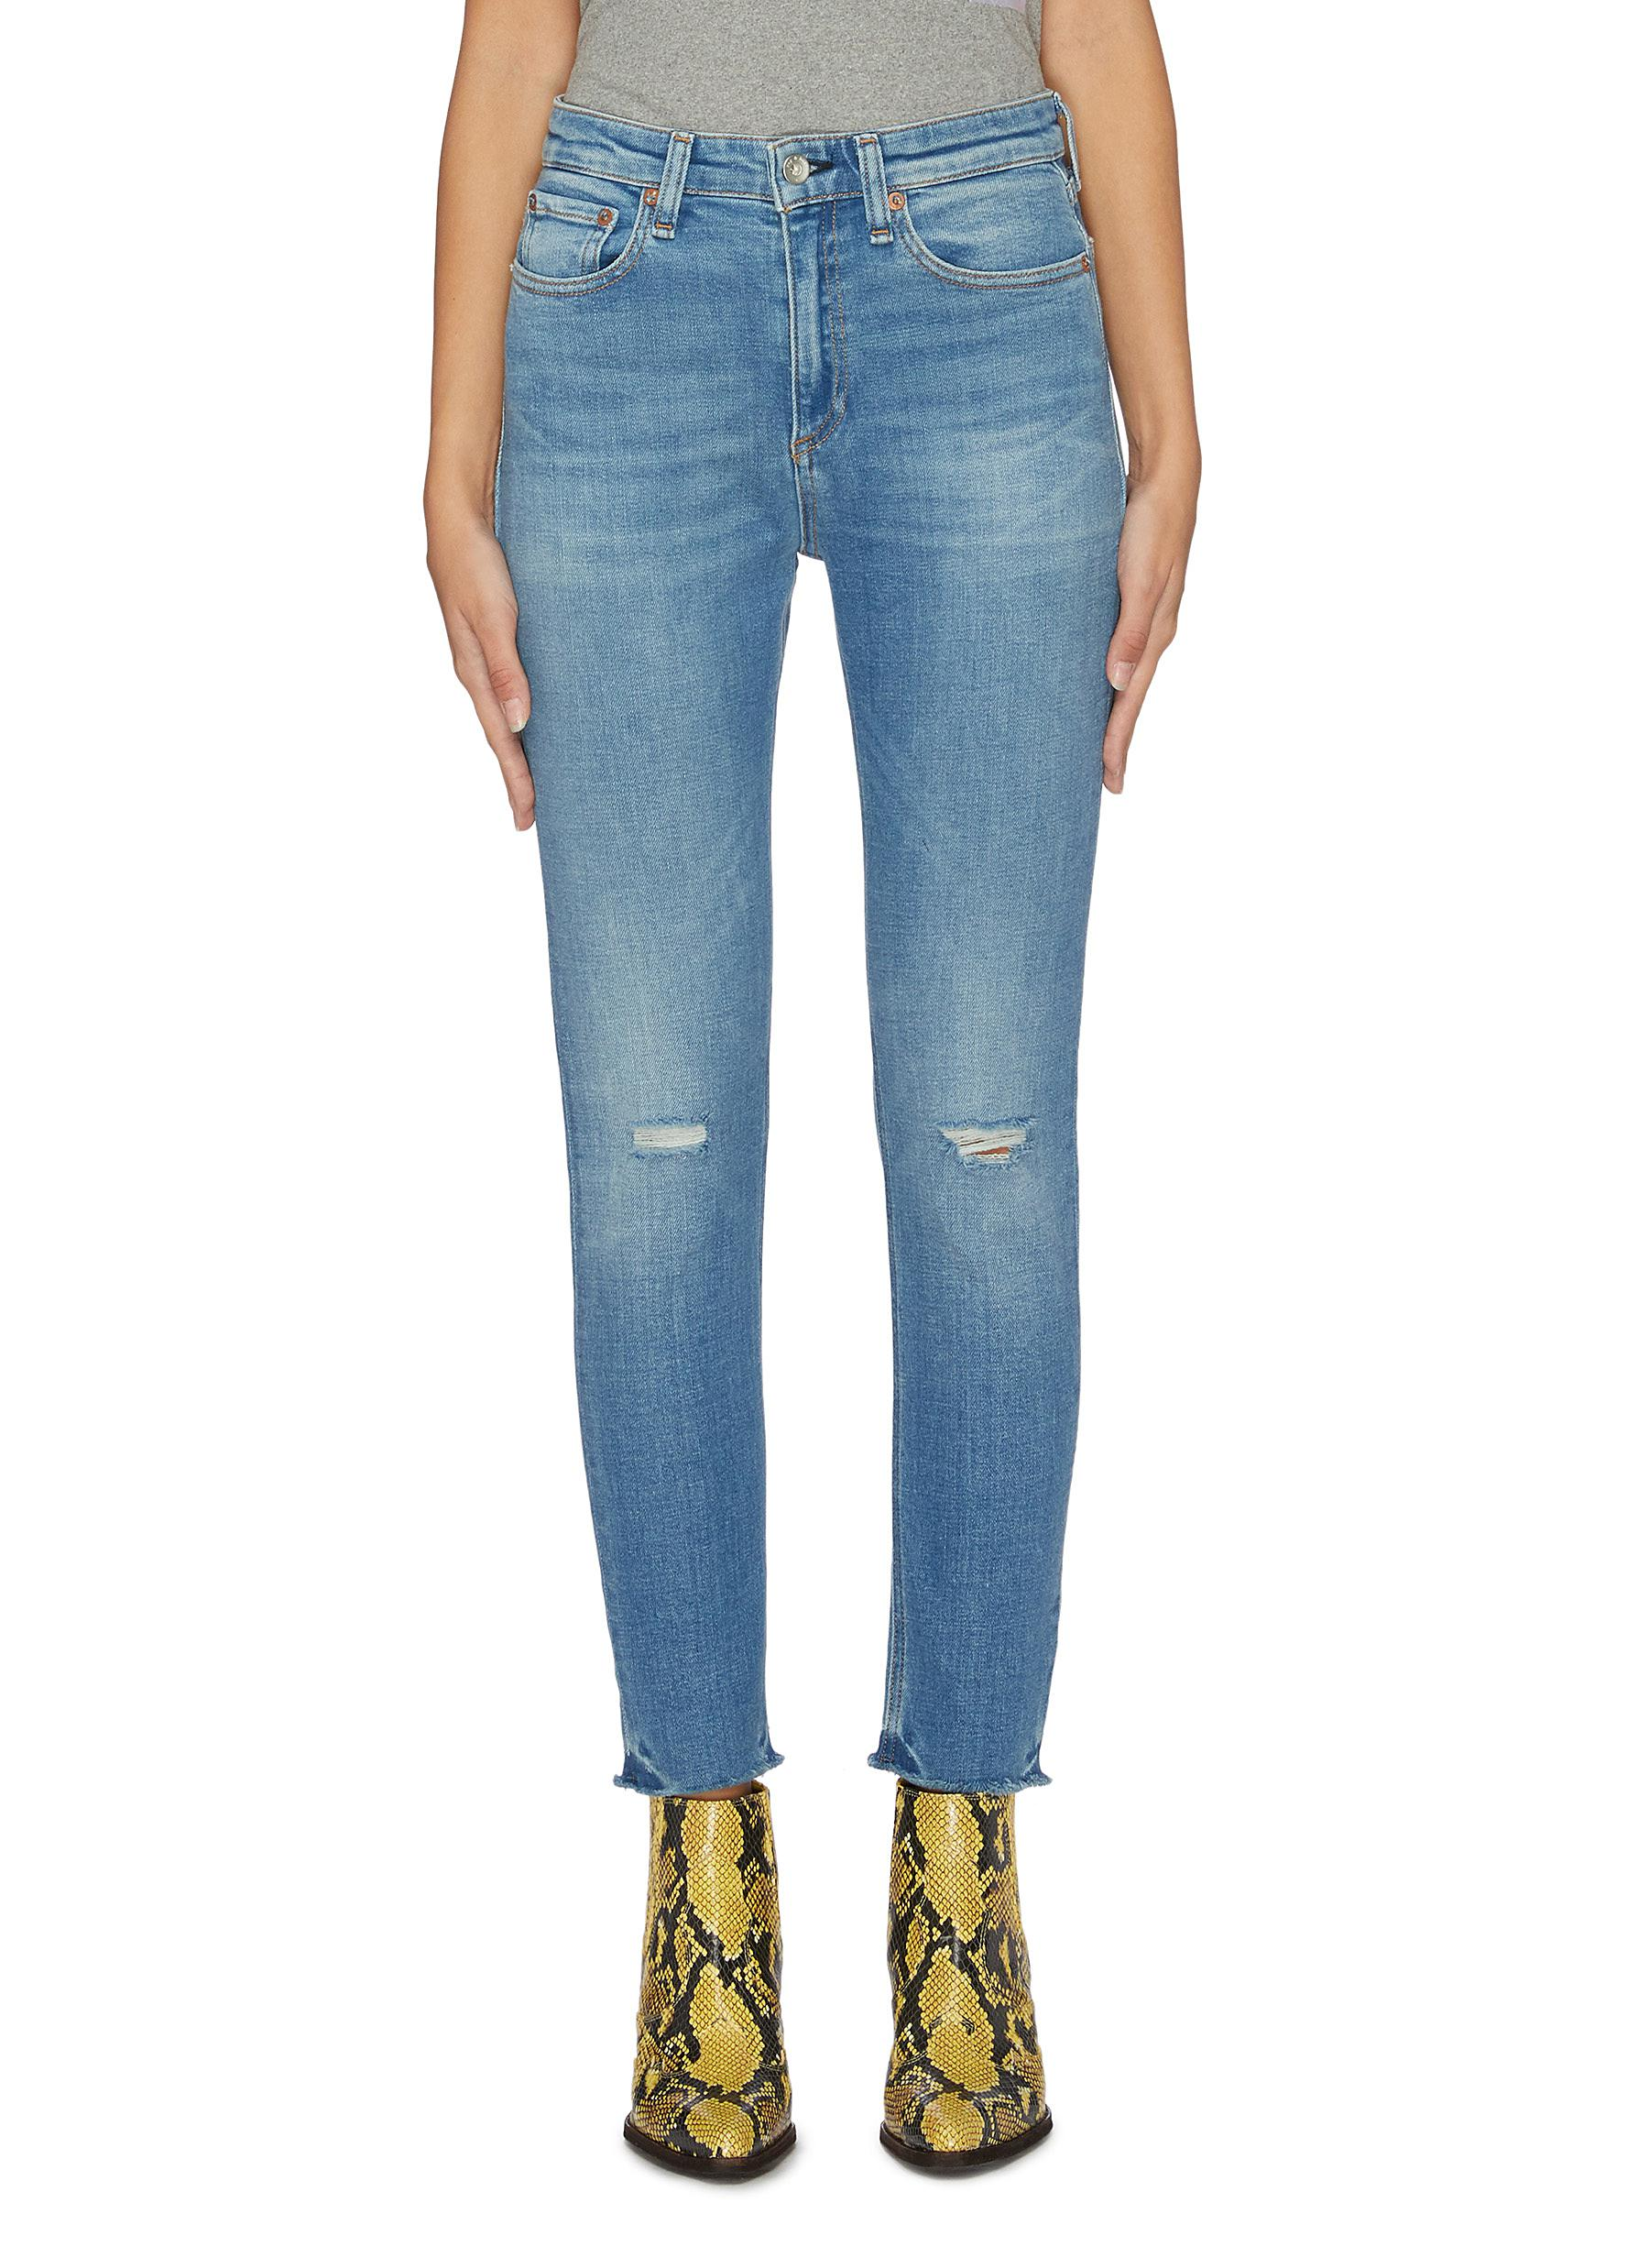 Nina ripped knee skinny jeans by Rag & Bone/Jean